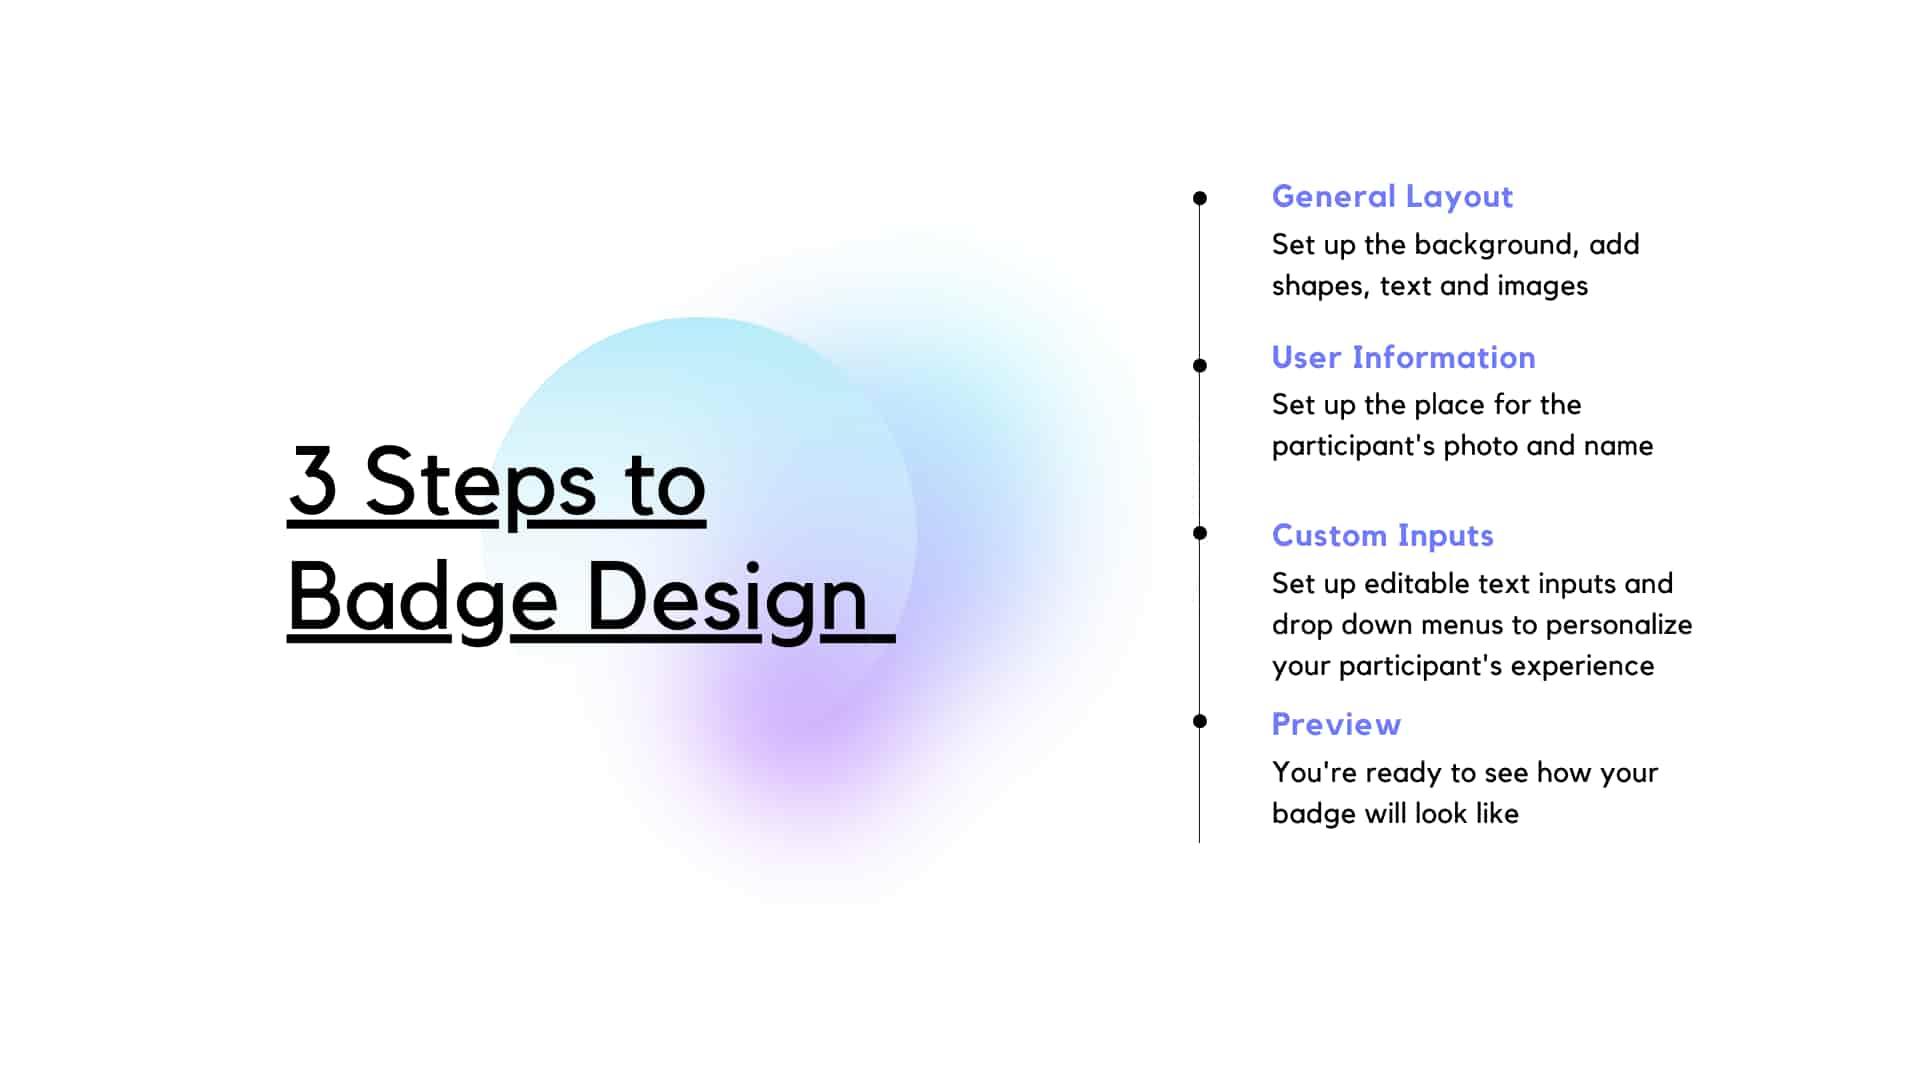 badge design 3 steps to do it